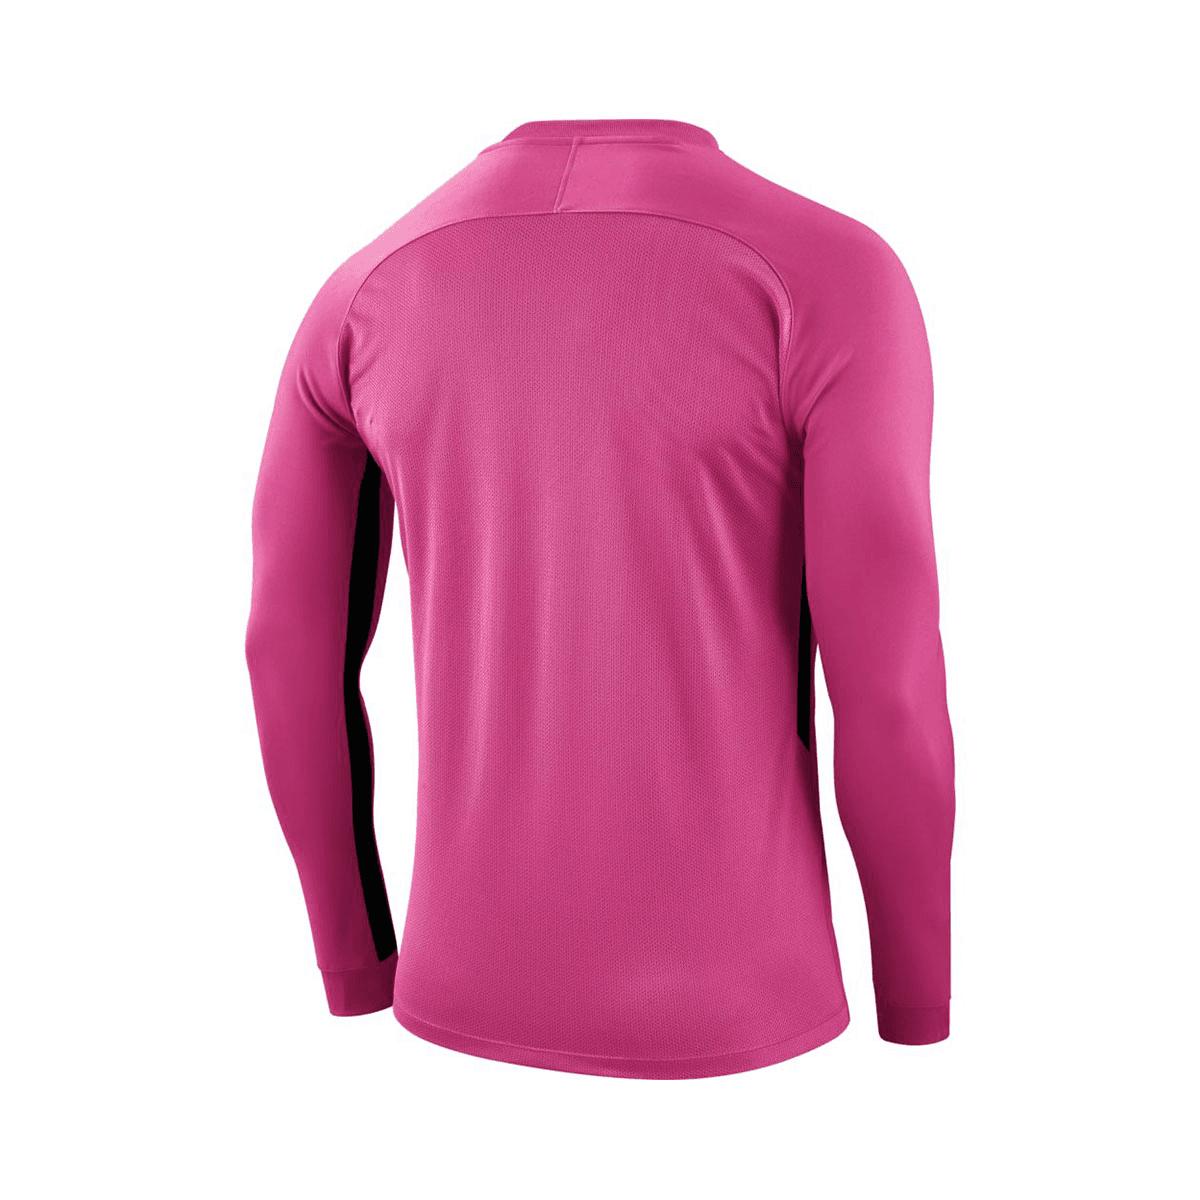 Nike Kinder Langarm Trikot Tiempo Premier pinkschwarz